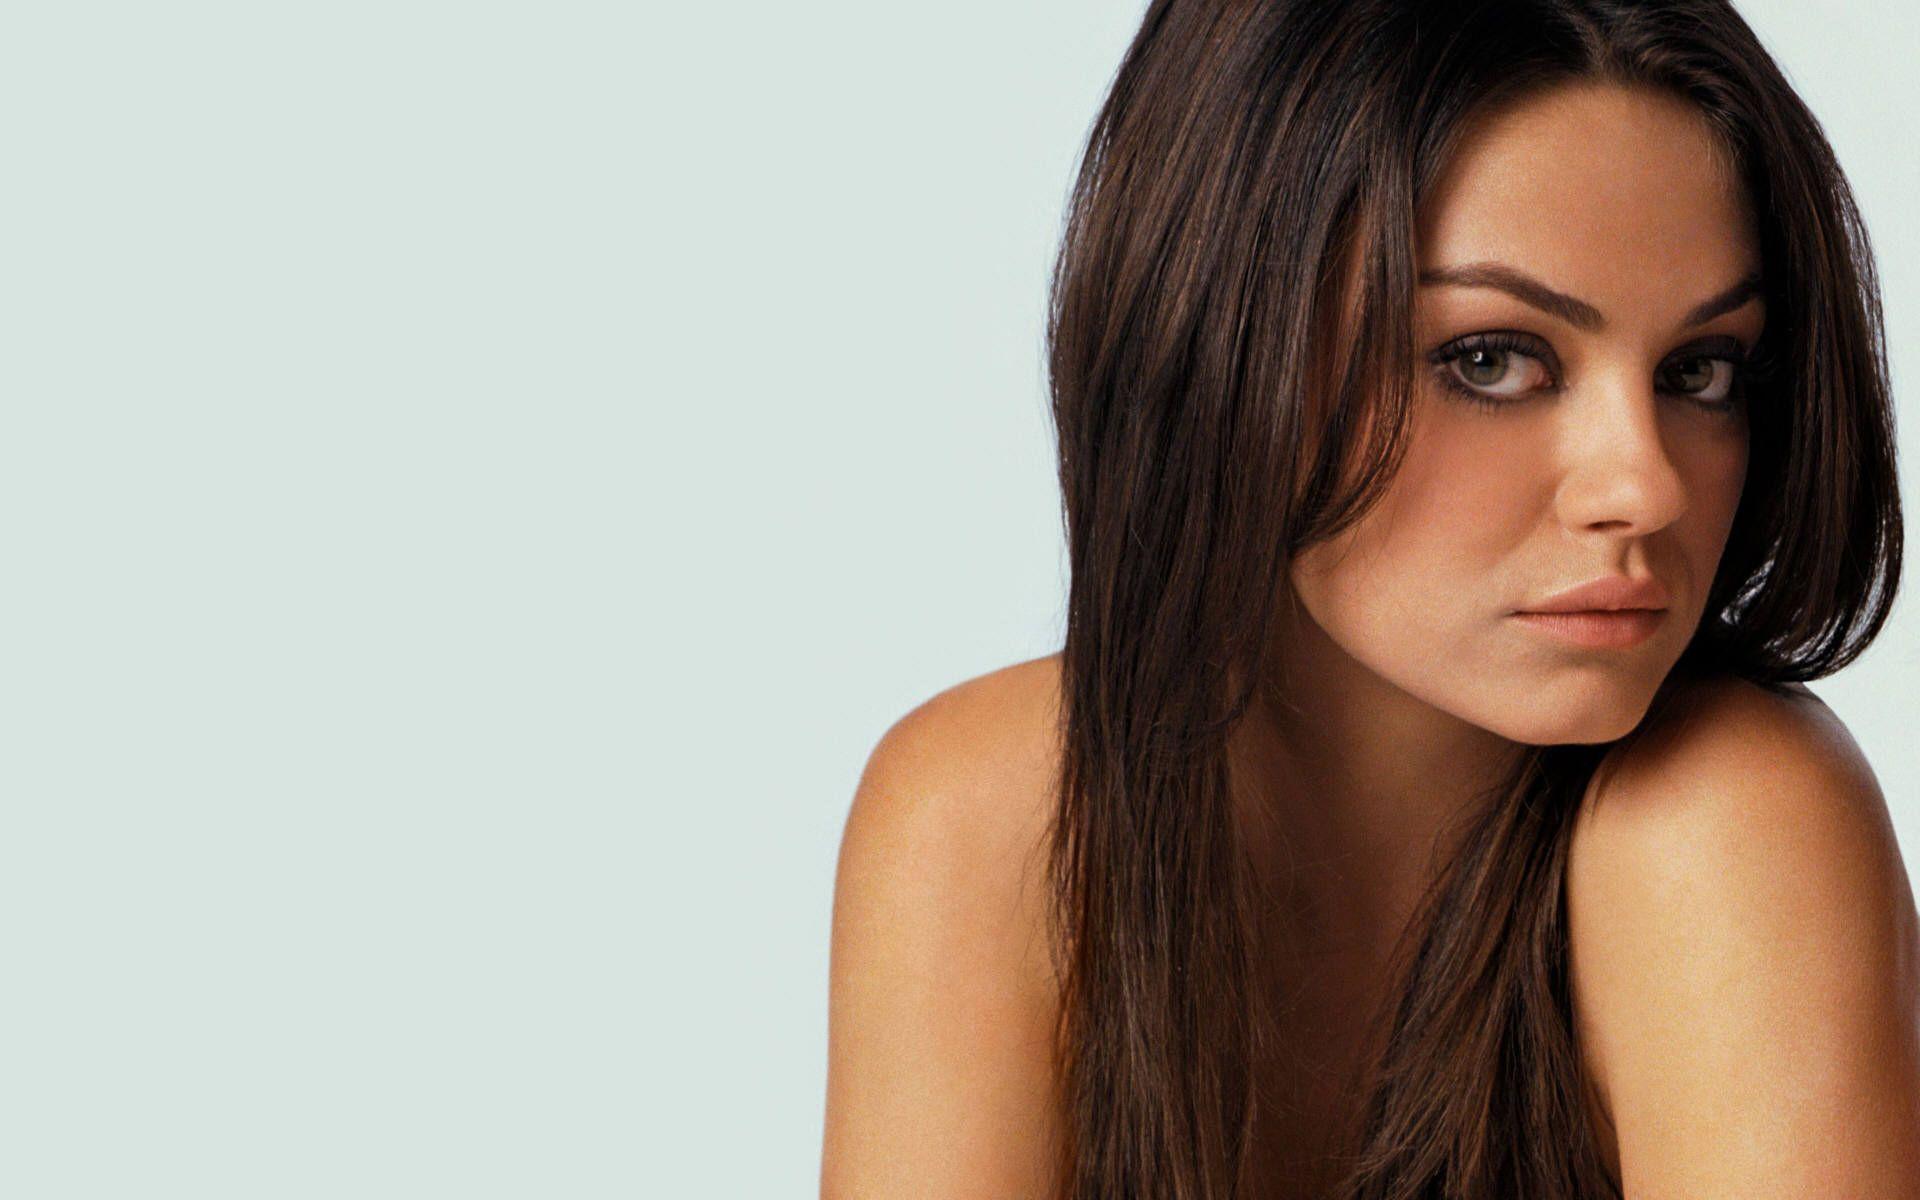 Mila Kunis Wallpaper 39277 in Celebrities F - Telusers.